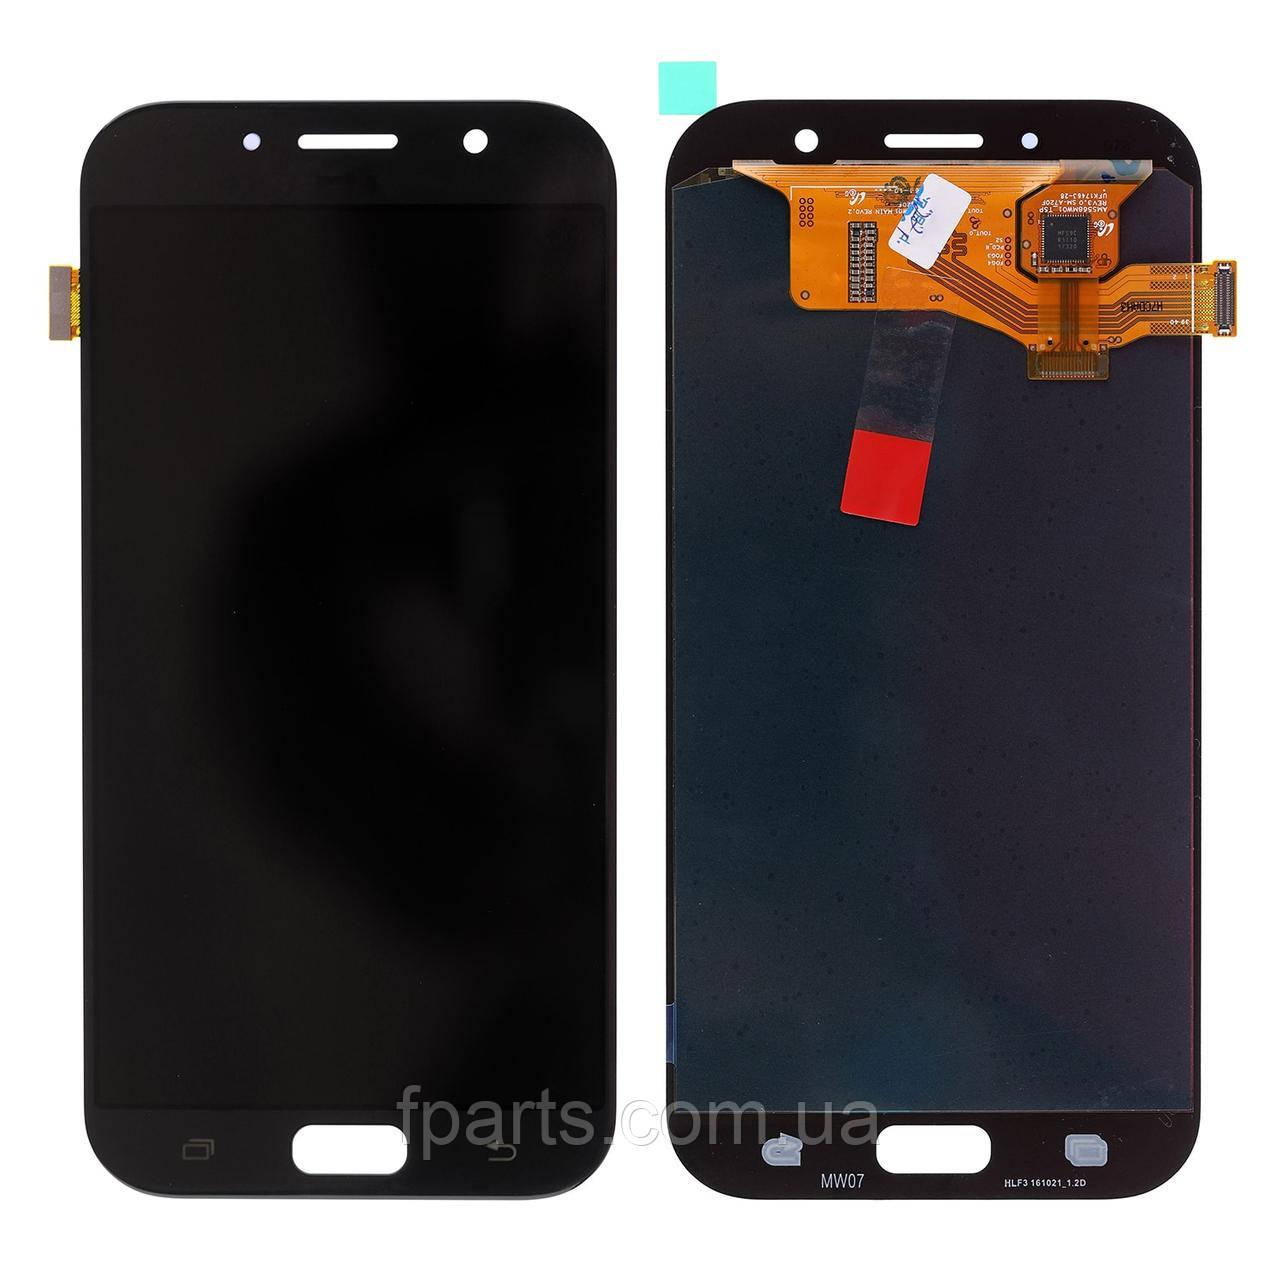 Дисплей для Samsung A720 Galaxy A7 2017 с тачскрином, Black (OLED)